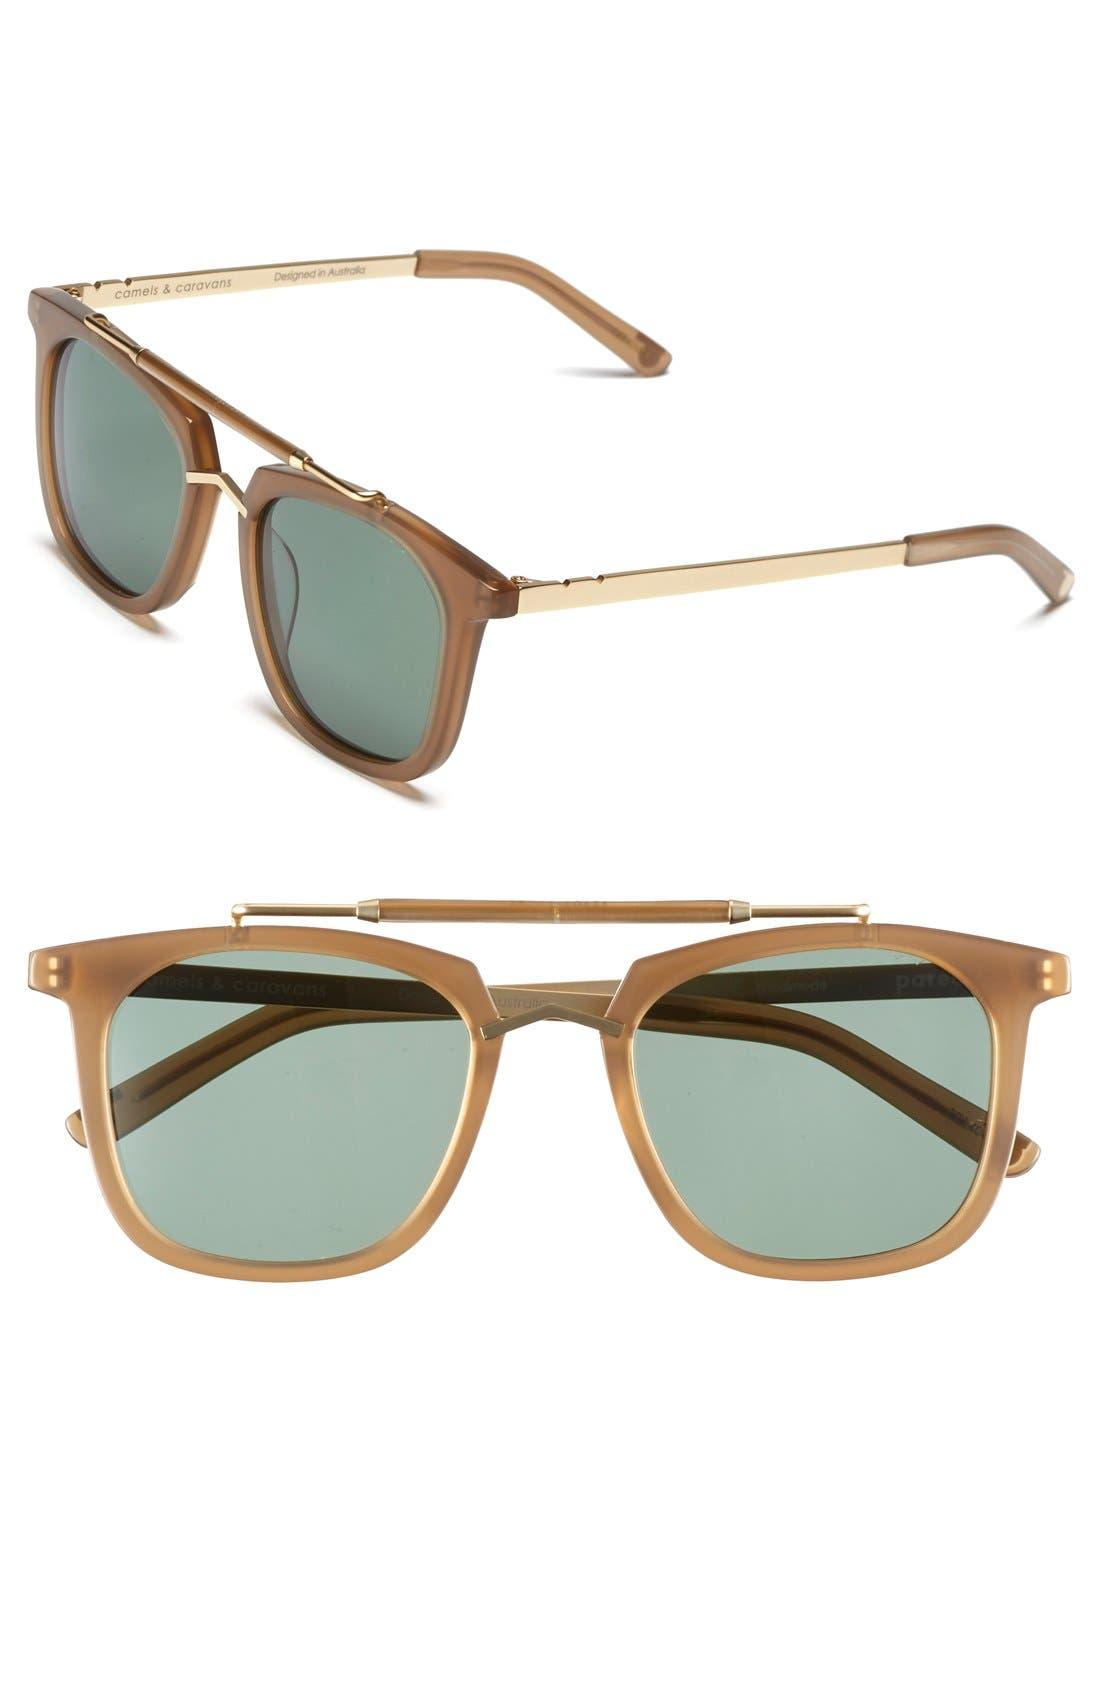 Amazing Camels Amp Caravans Sunglasses By Pared Eyewear  Moda Operandi